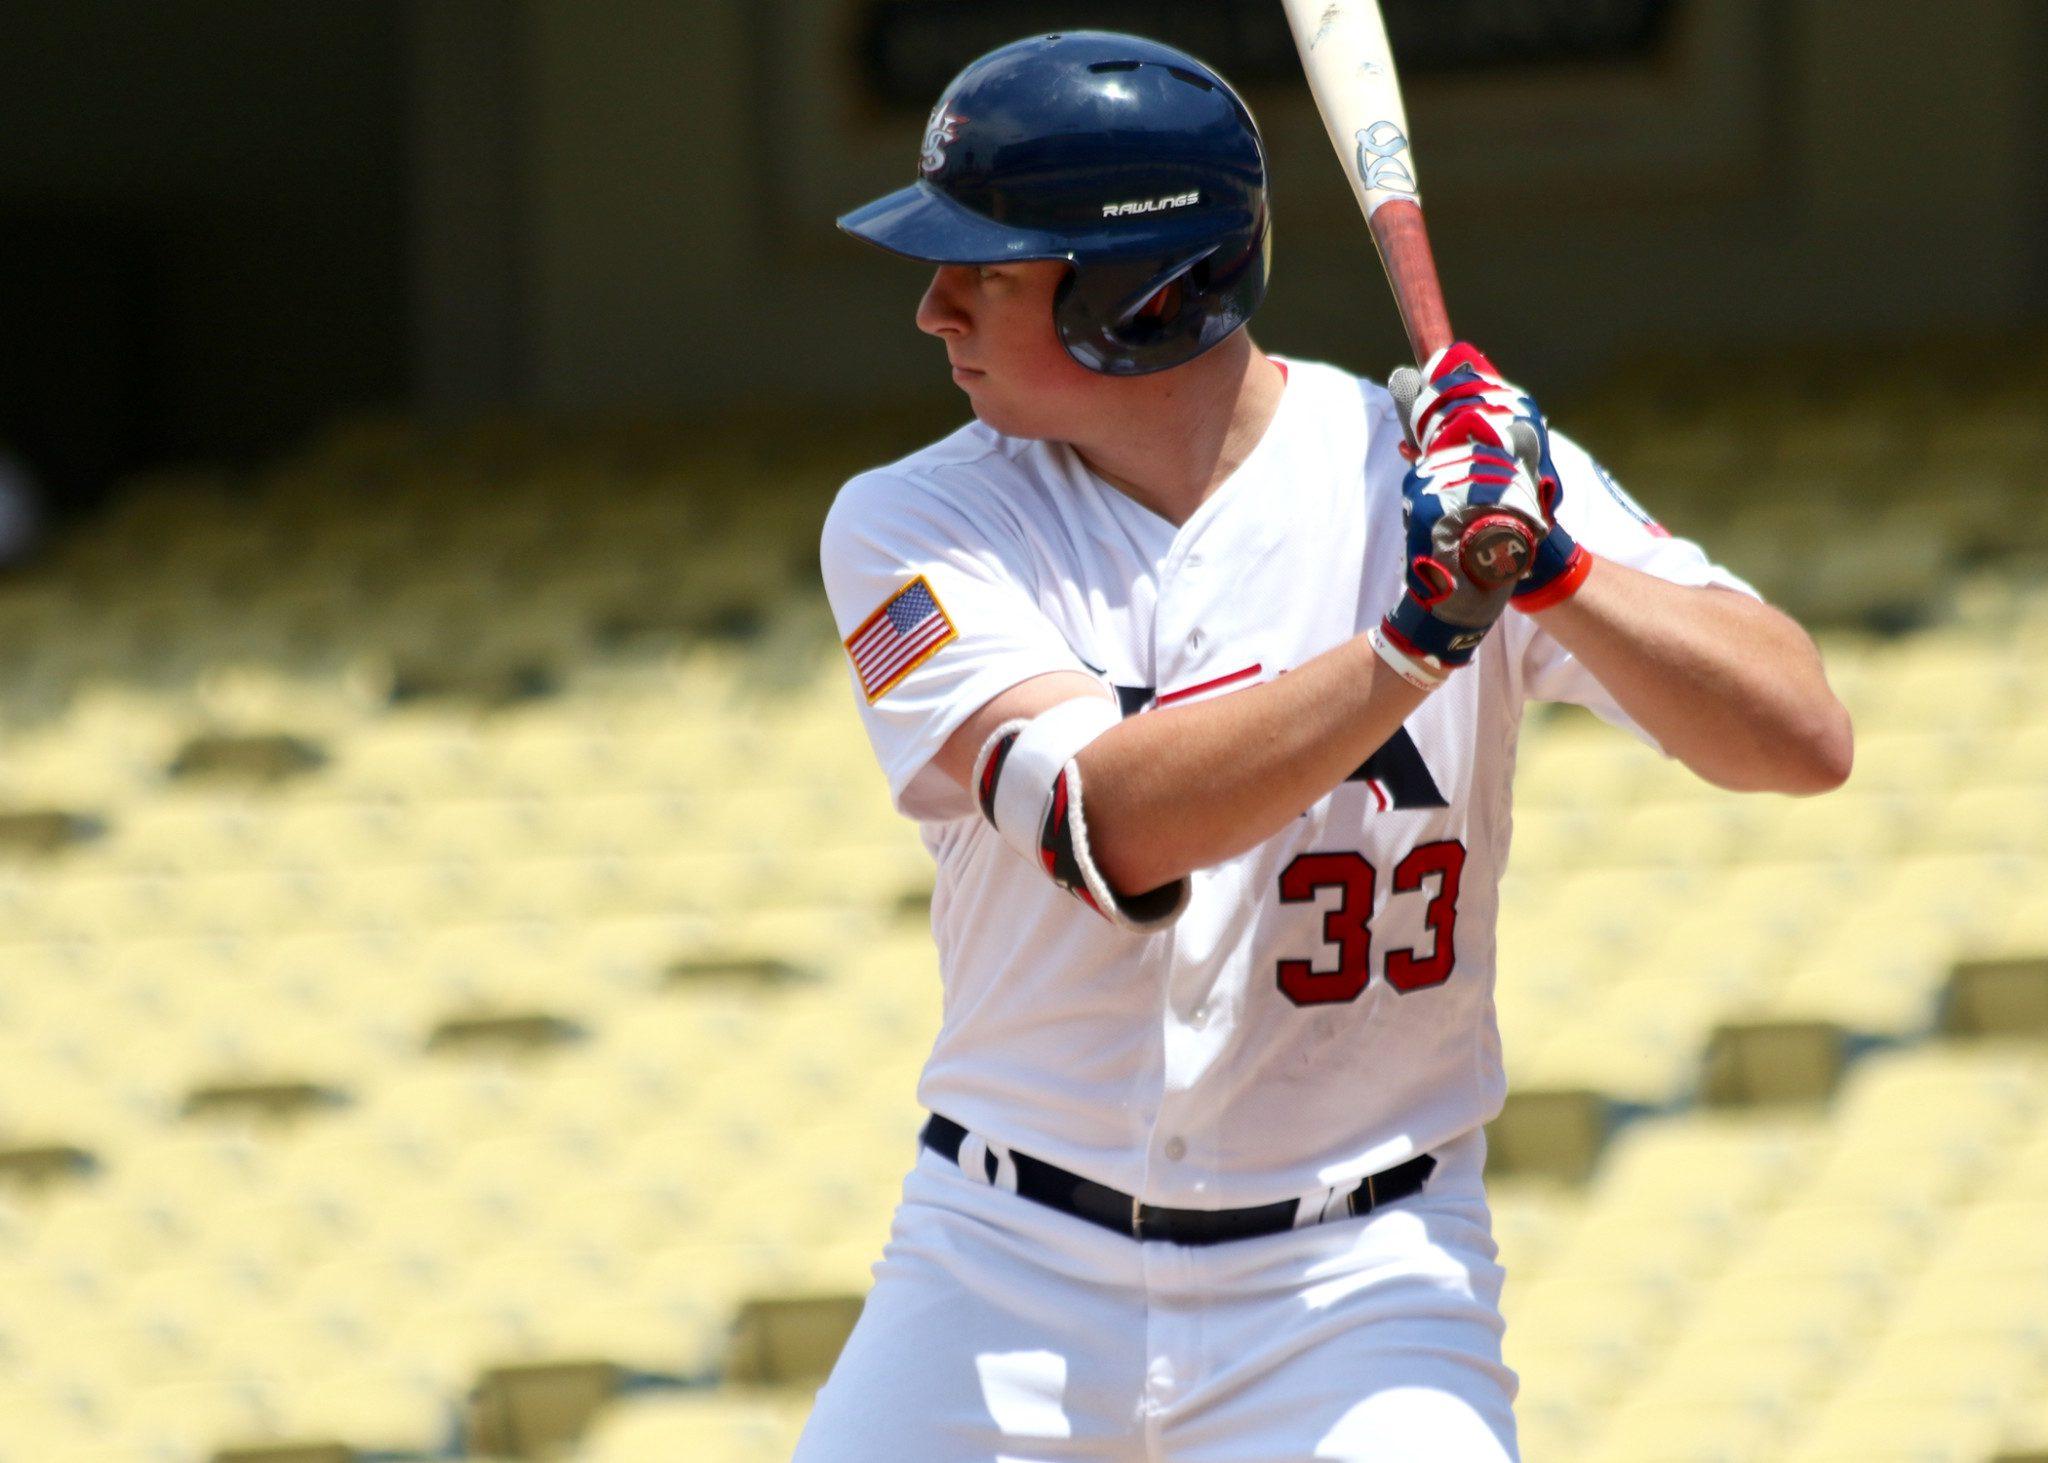 Brendan McKay, Team USA